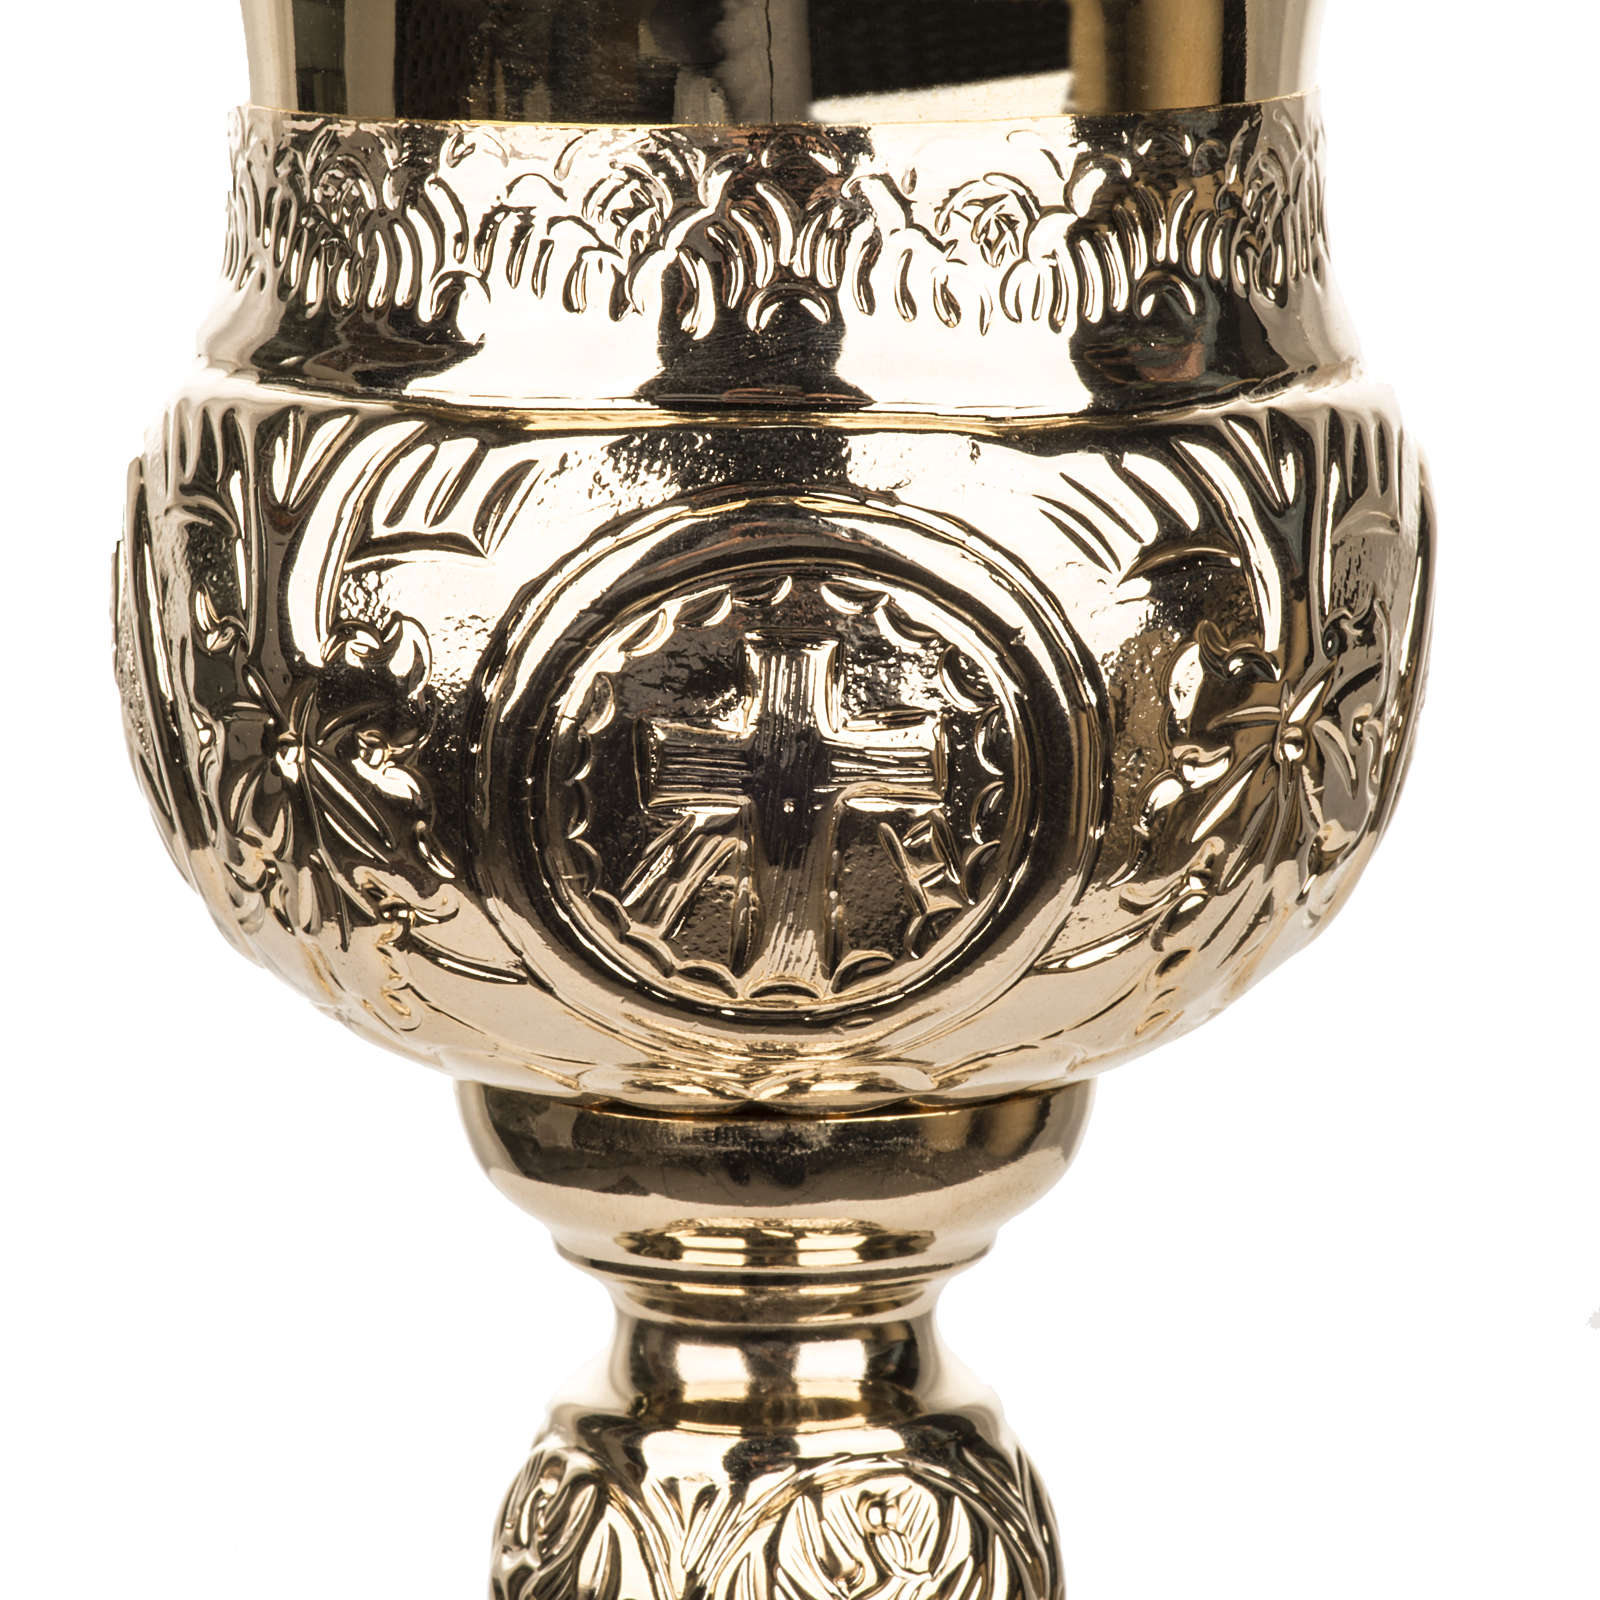 Calice 4 evangelisti ottone dorato 4